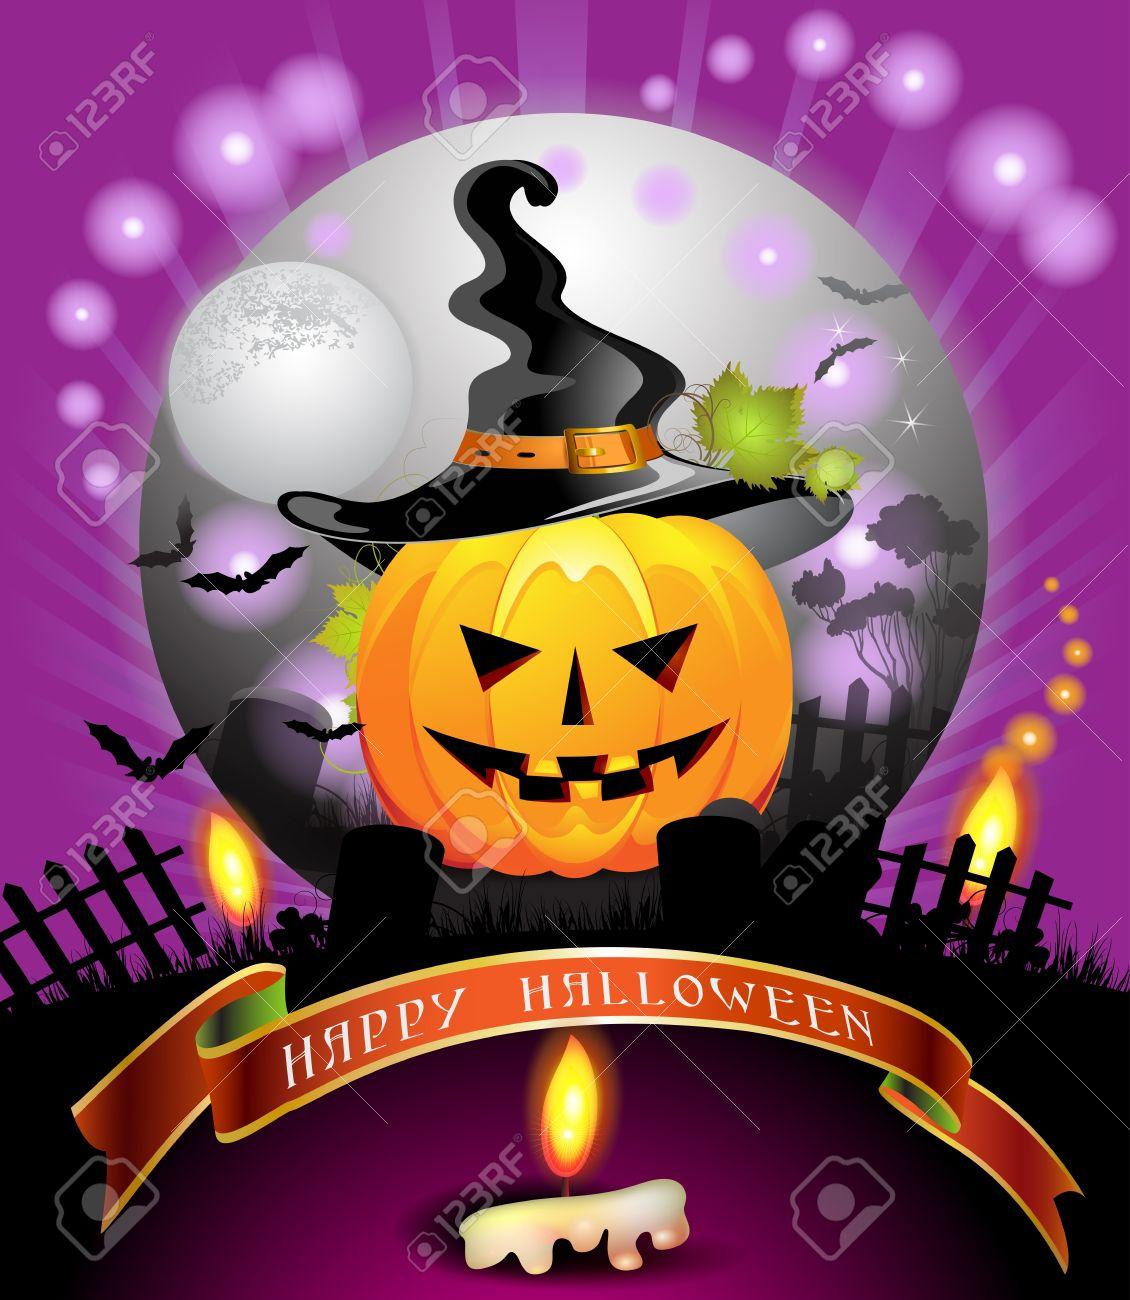 Halloween card design with pumpkin Stock Vector - 14958010